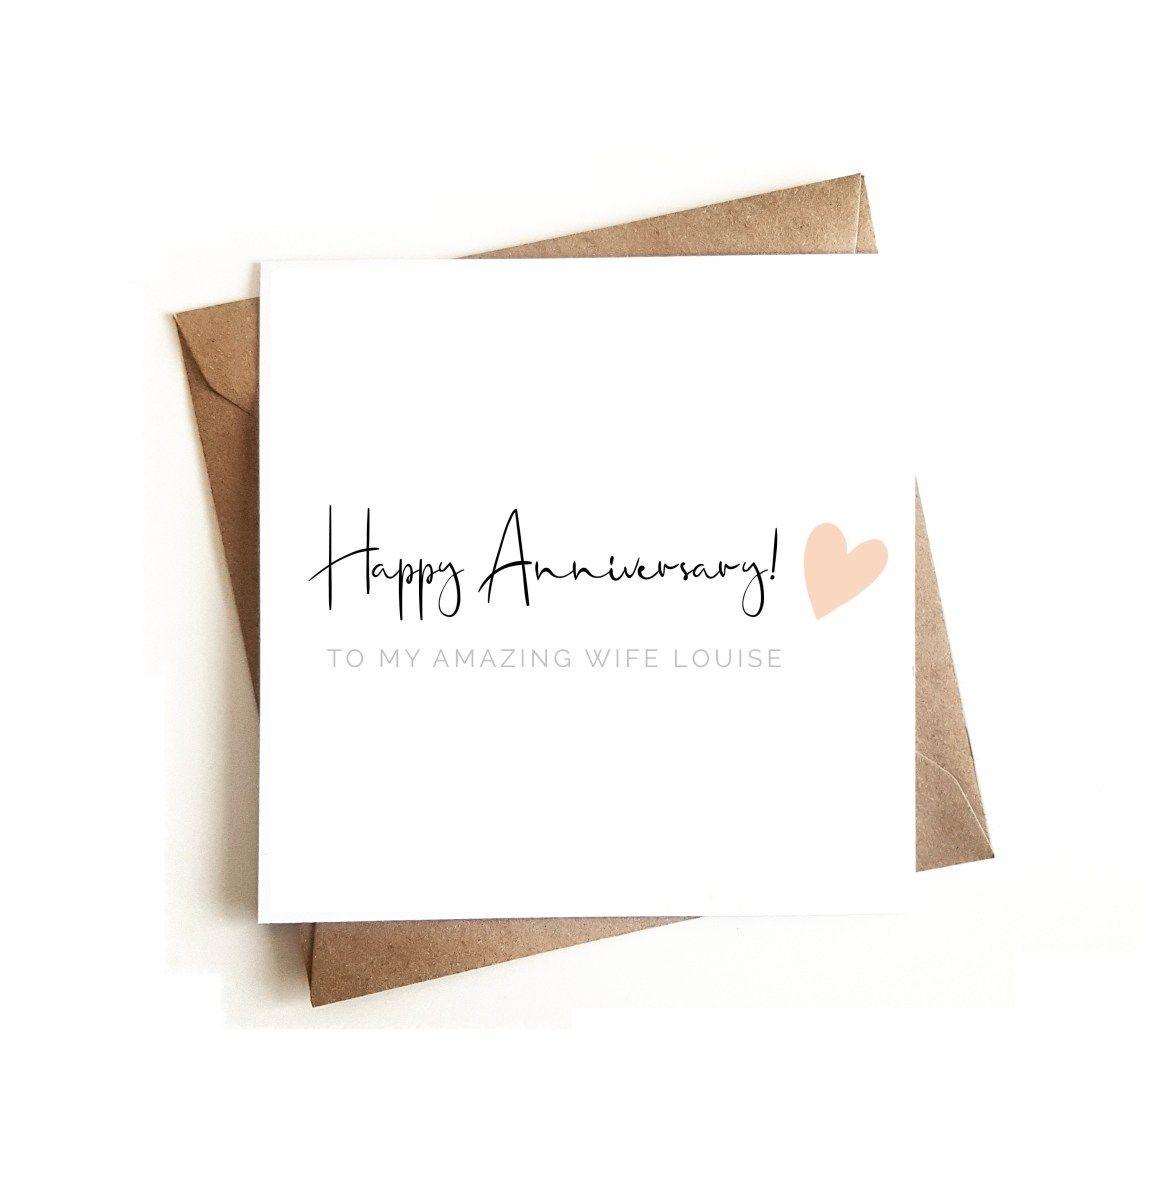 Personalised Anniversary Card Ashley Higgins Design Greeting Cards Personalized Anniversary Cards Personalized Anniversary Anniversary Cards